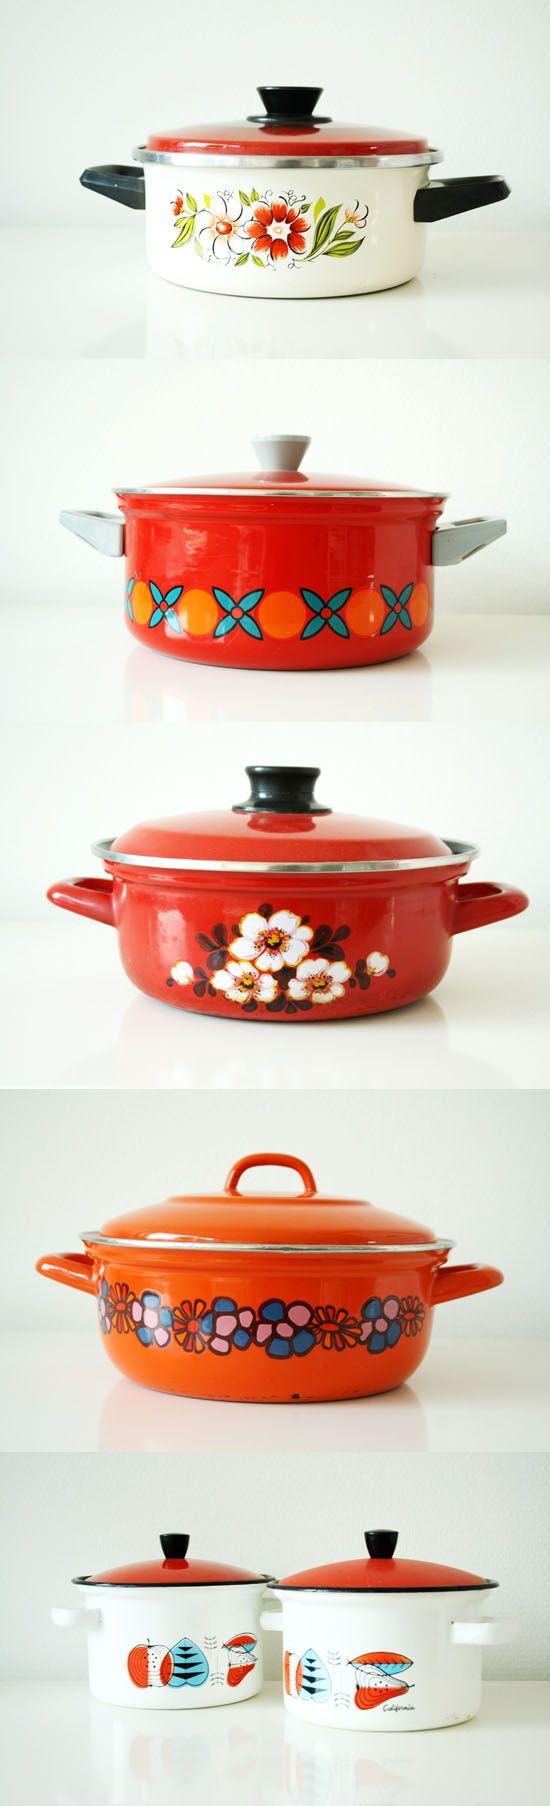 Colorful vintage cooking pans!